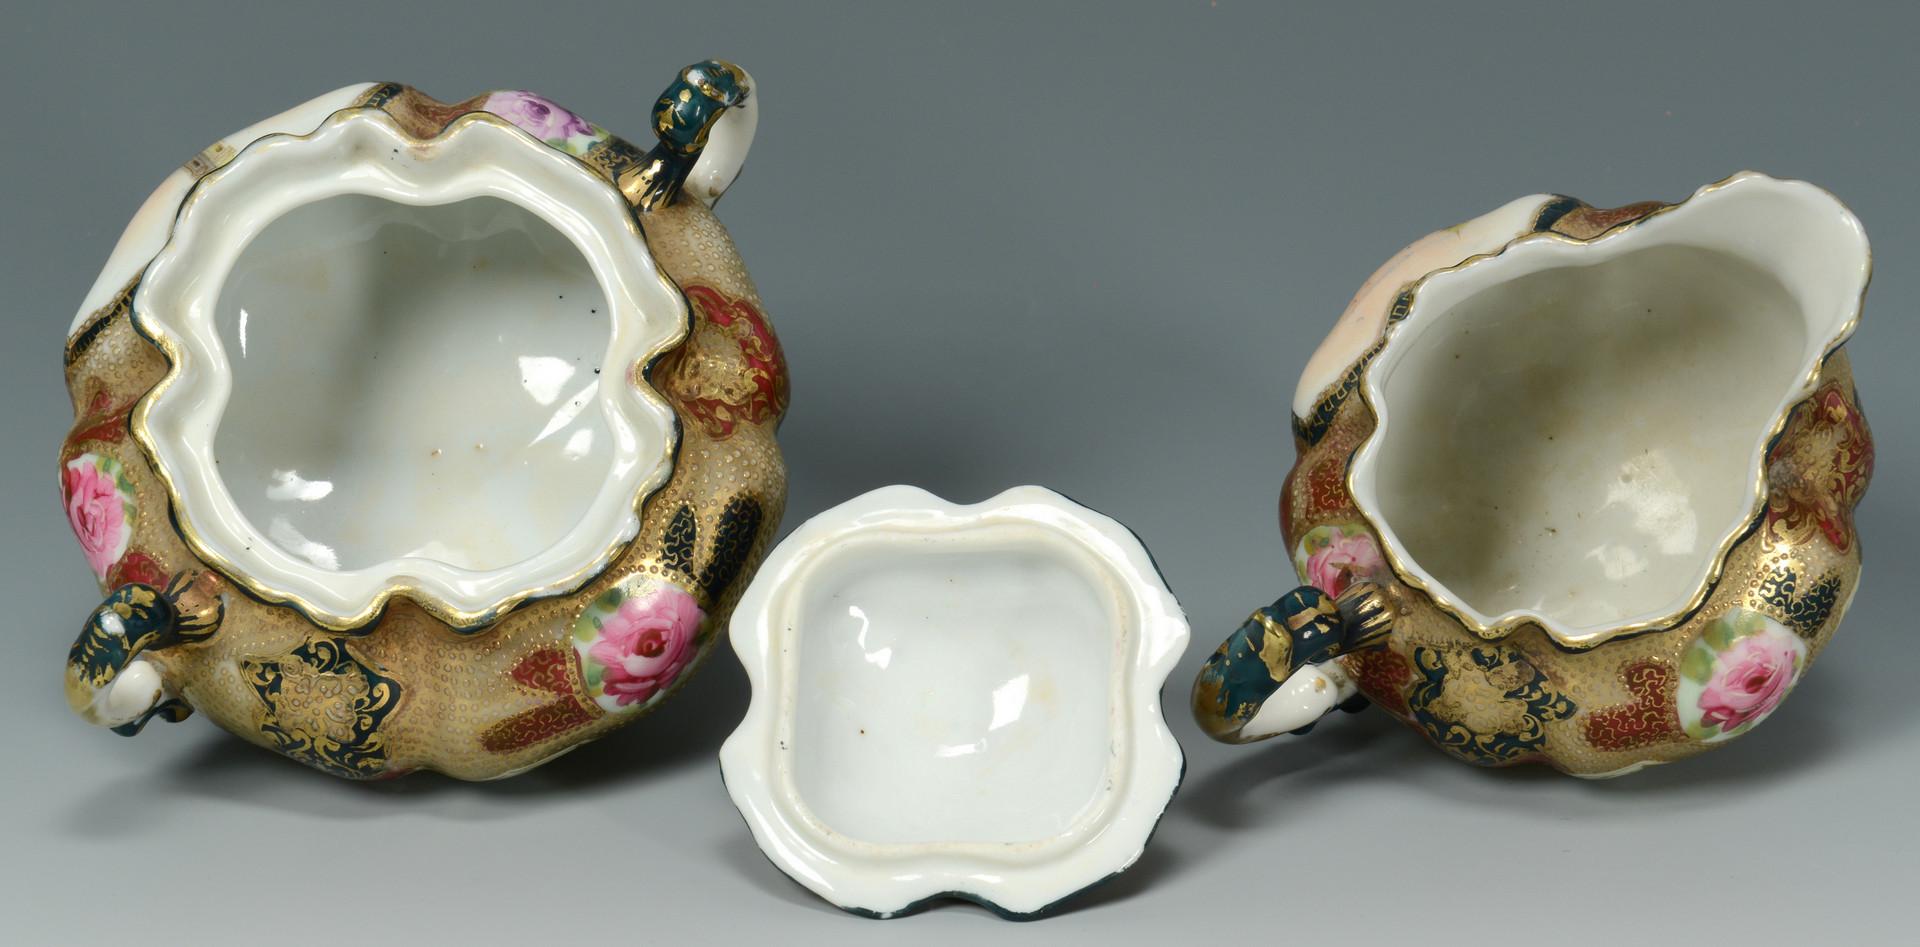 Lot 893: 3 World's Fair Columbian Exhib. Porcelain Items